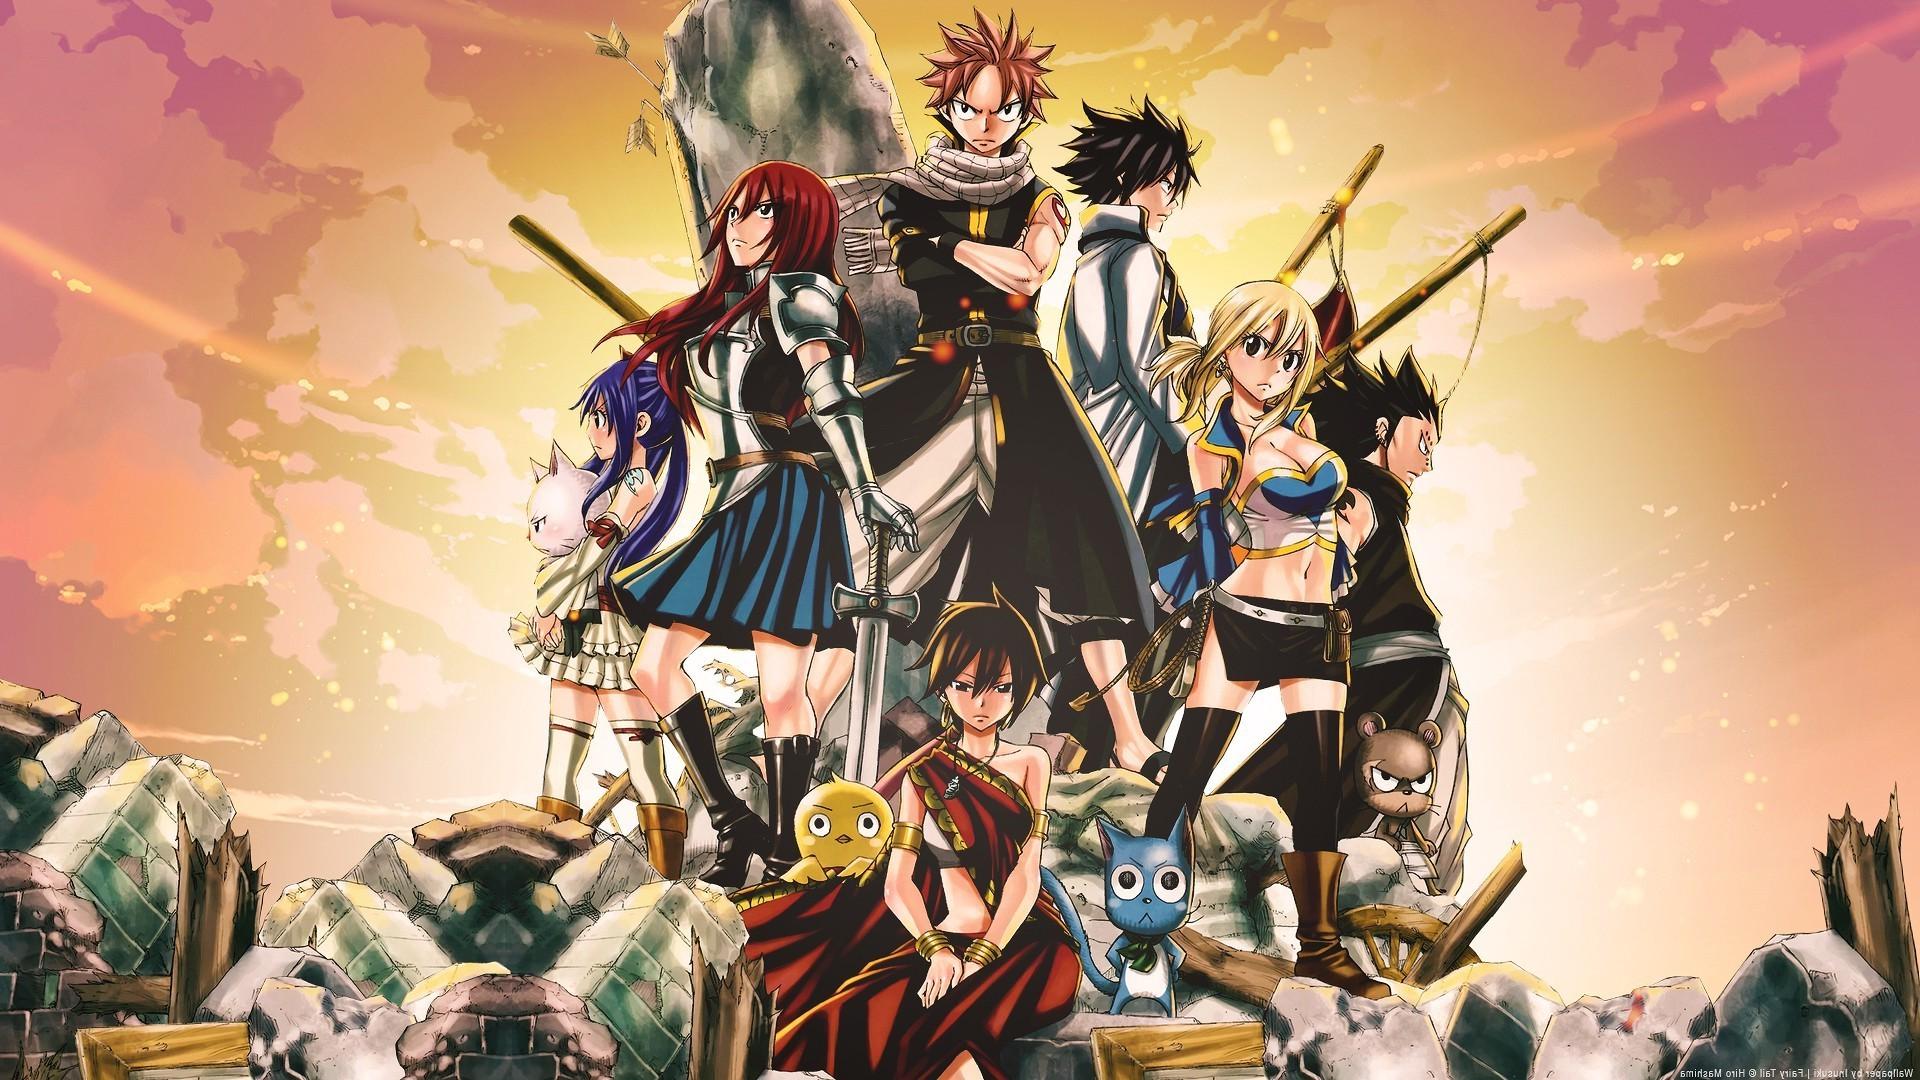 Anime Wallpaper 1366x768 1